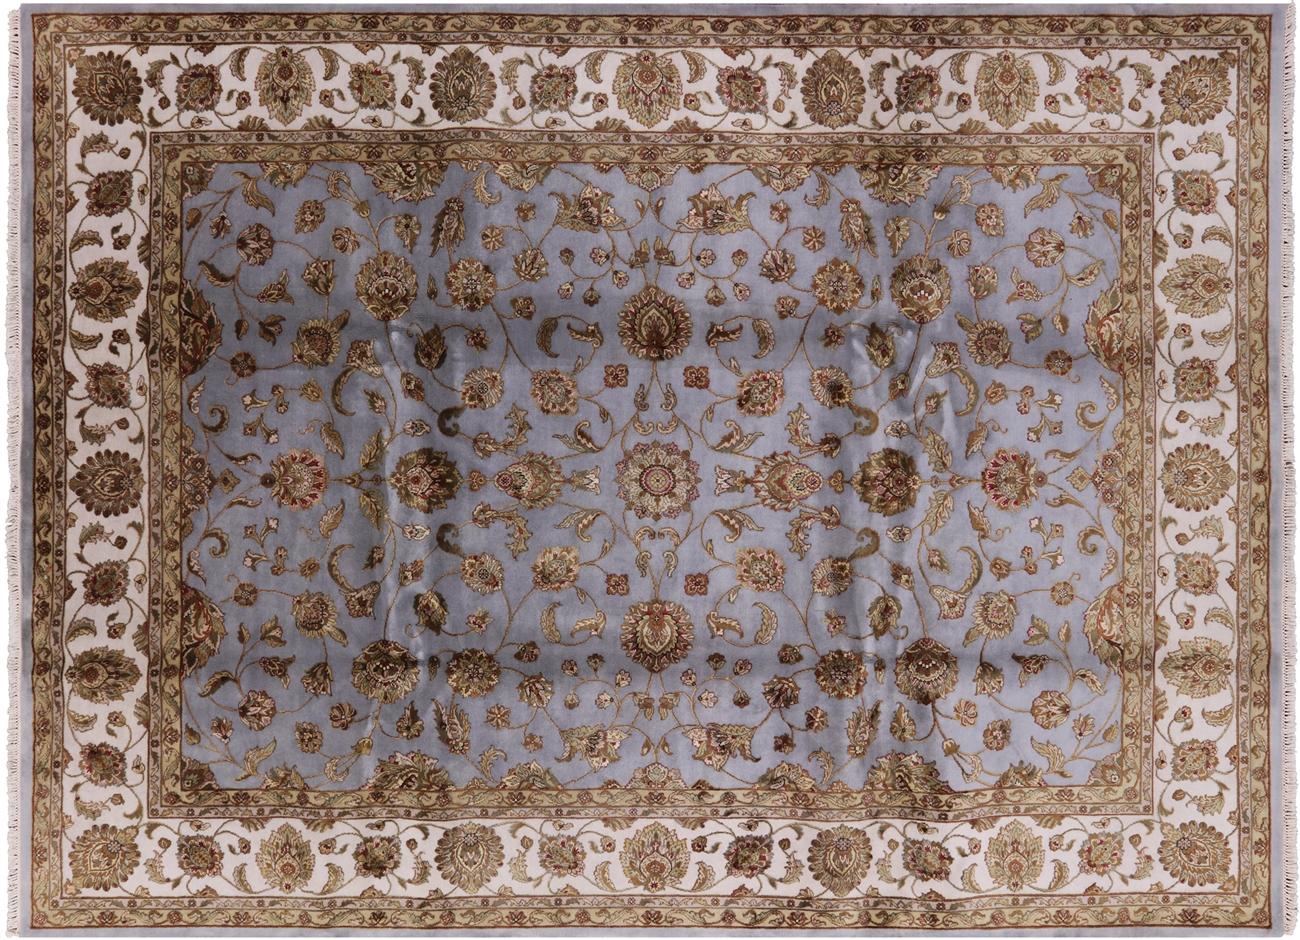 50c0b59c7e Oriental Blue Rajasthan 9'x12' Wool & Silk Hand Knotted Wool Rug ...